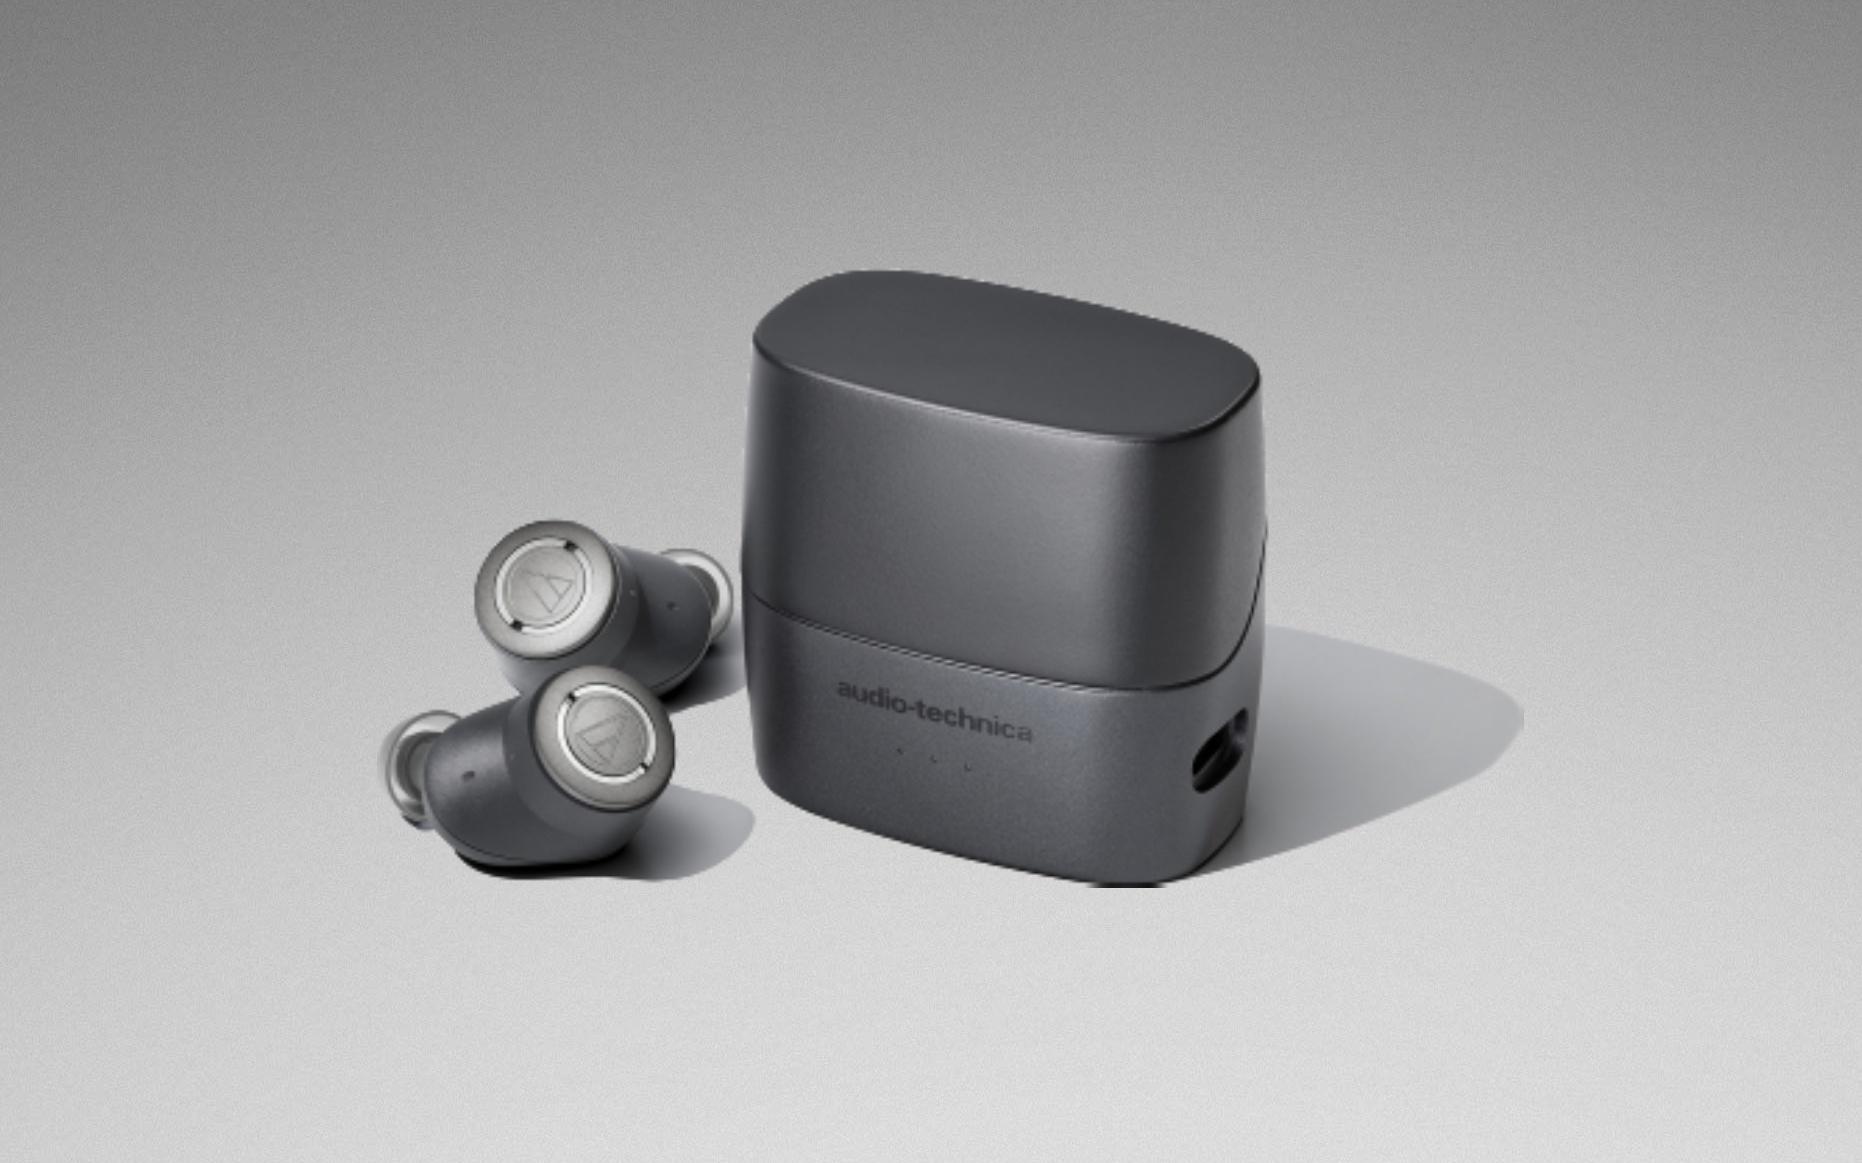 Audio-Technica ukázala sluchátka ANC300TW